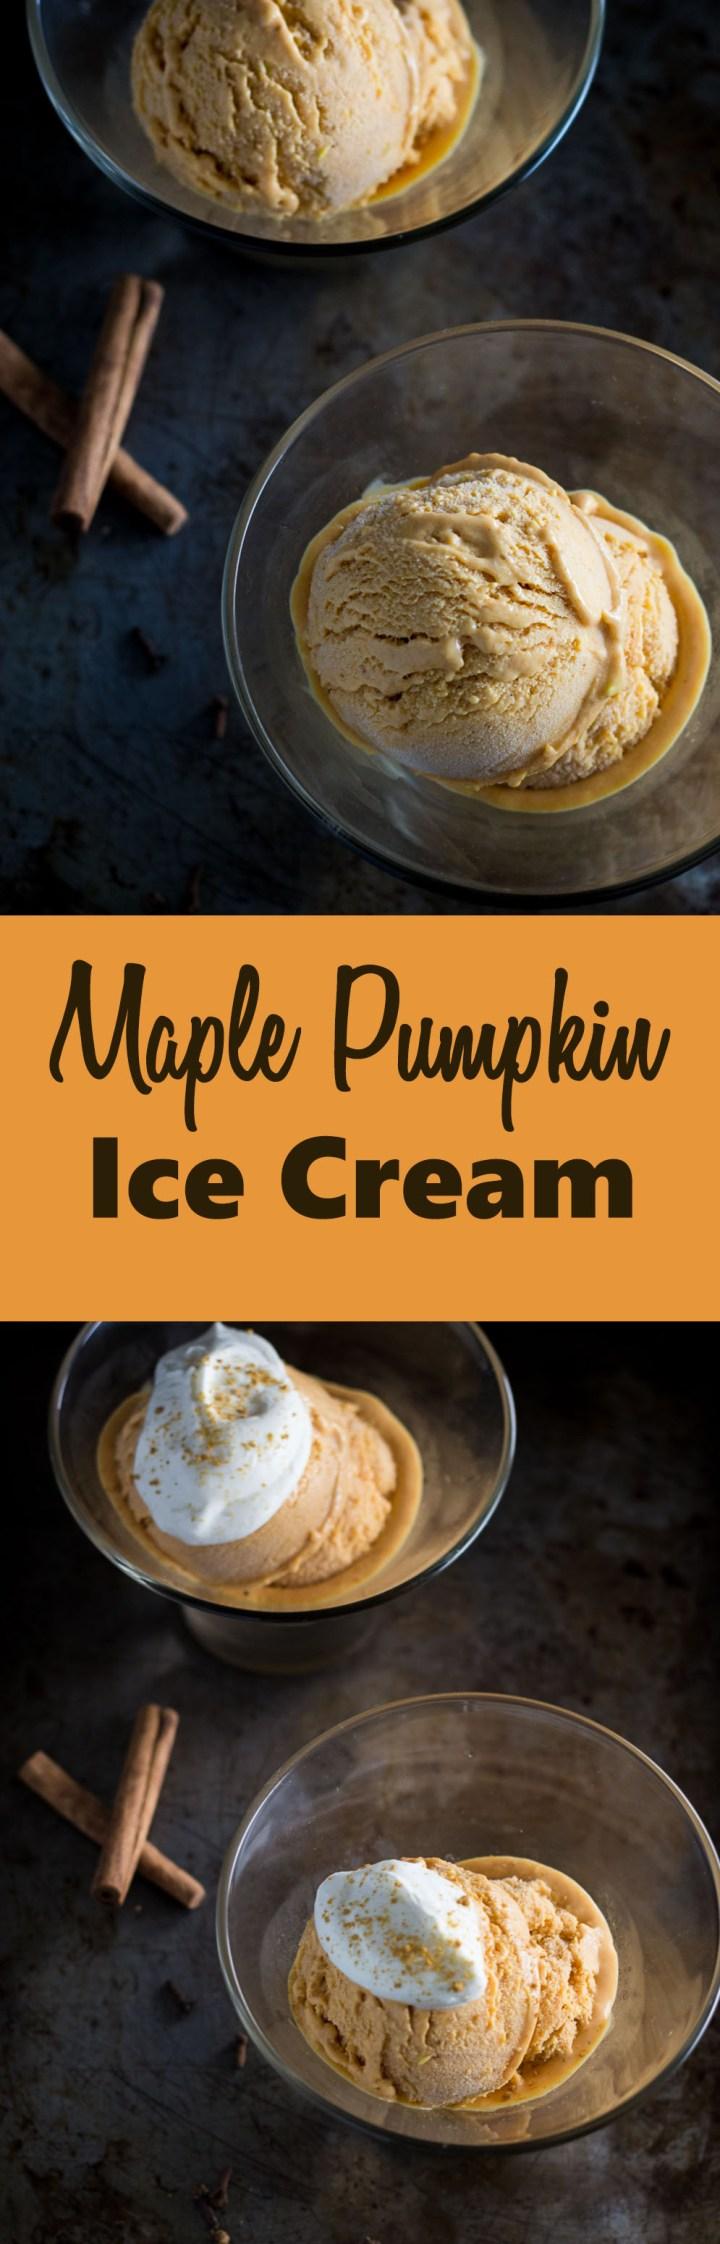 Maple Pumpkin Ice Cream #pumpkin #icecream #dessert #fall #thanksgiving